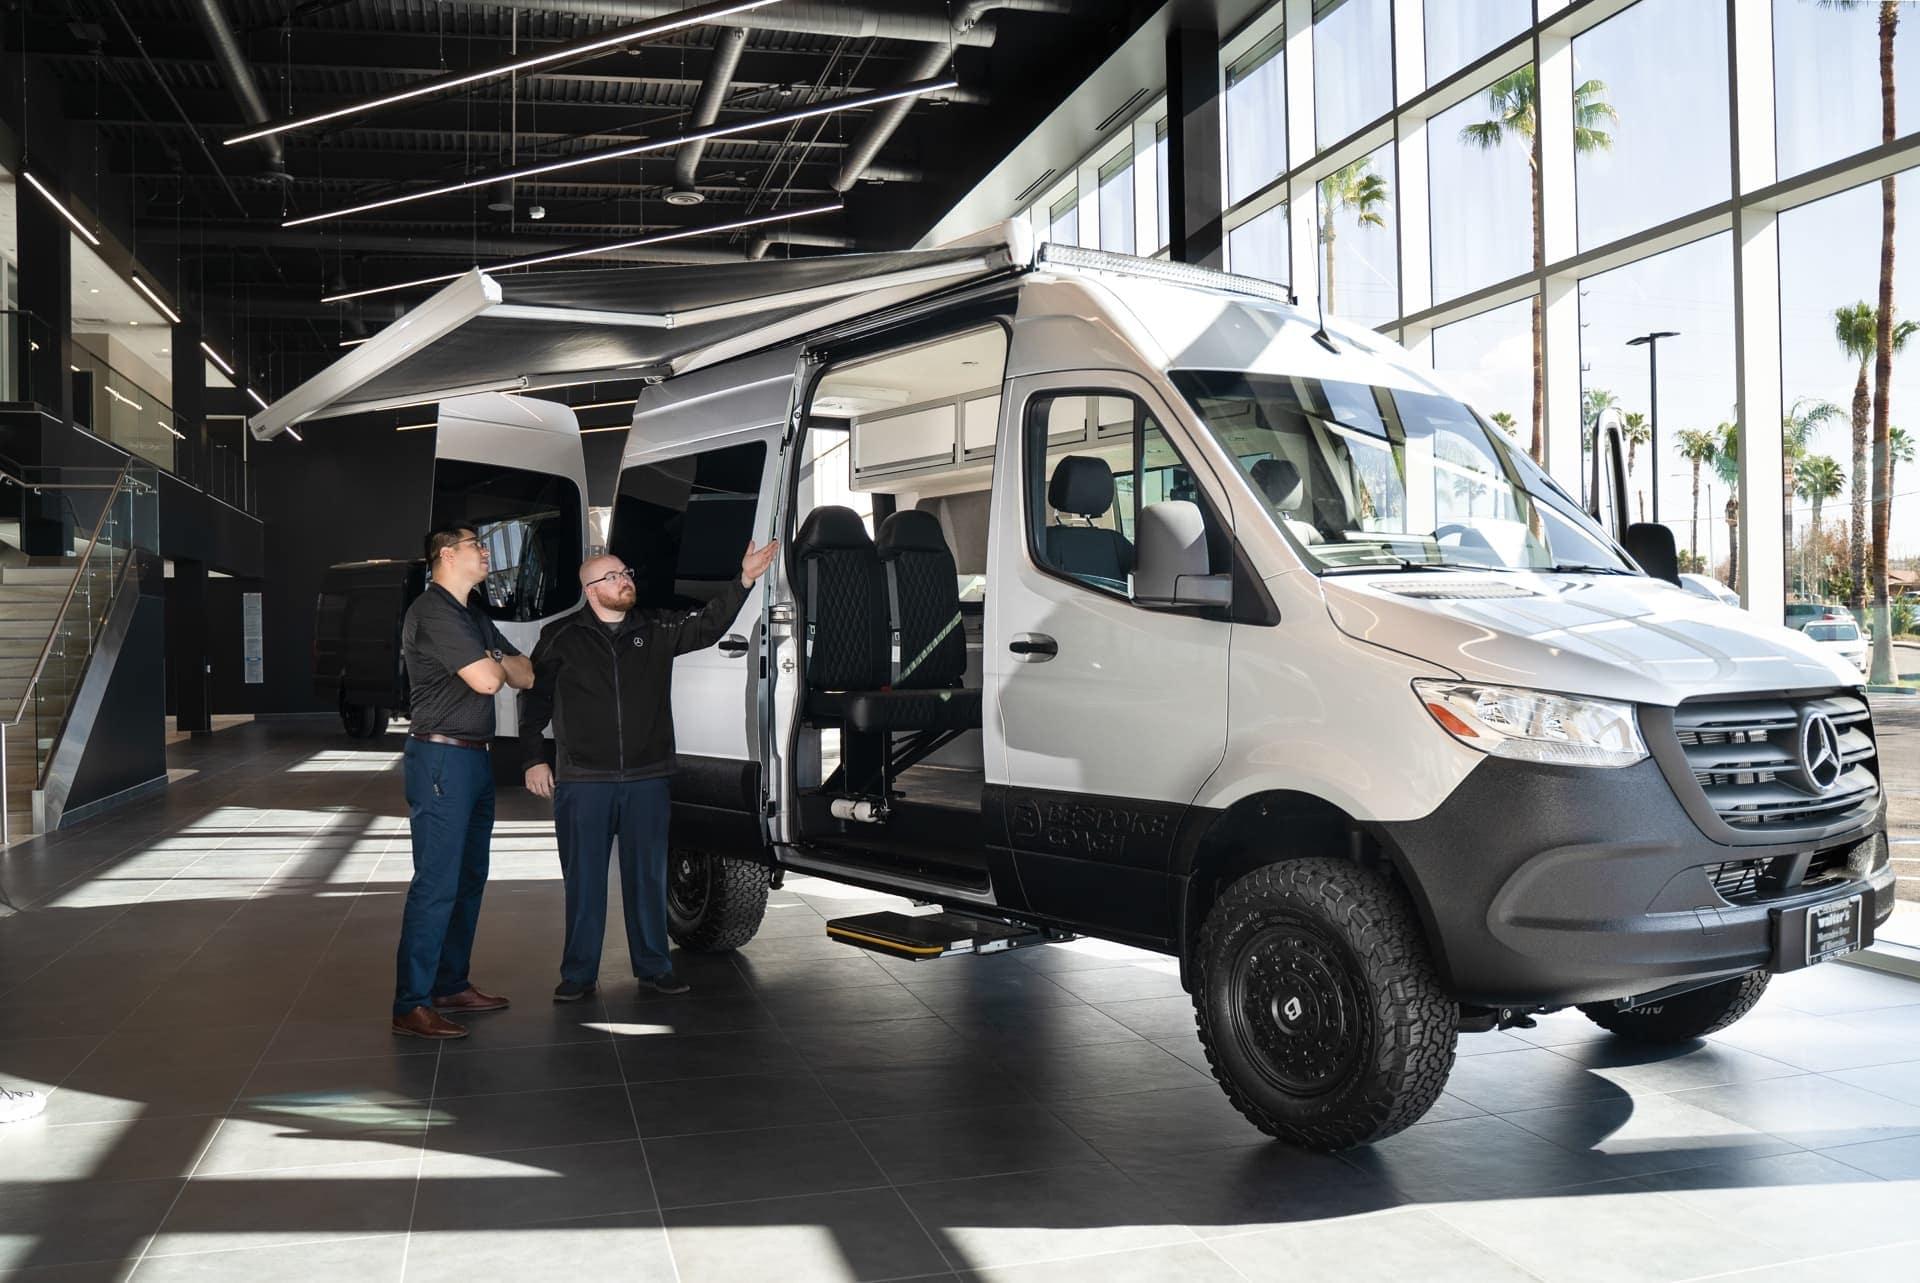 Sprinter Cargo Vans for sale in Riverside